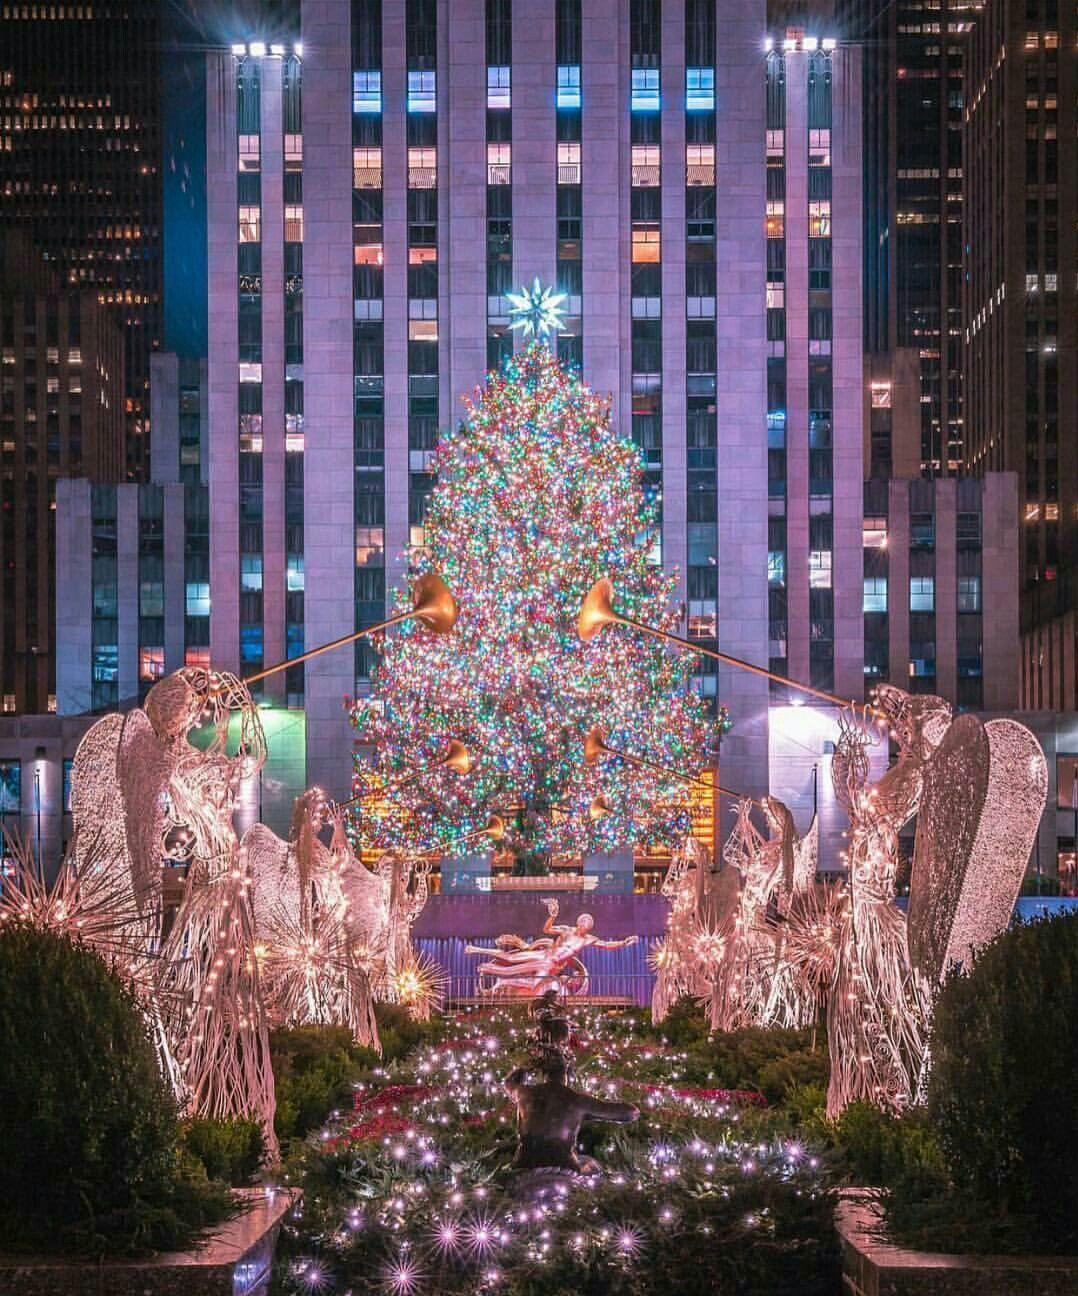 Christmas Tree In Ny: Rockefeller Center Christmas Tree, New York City, USA In